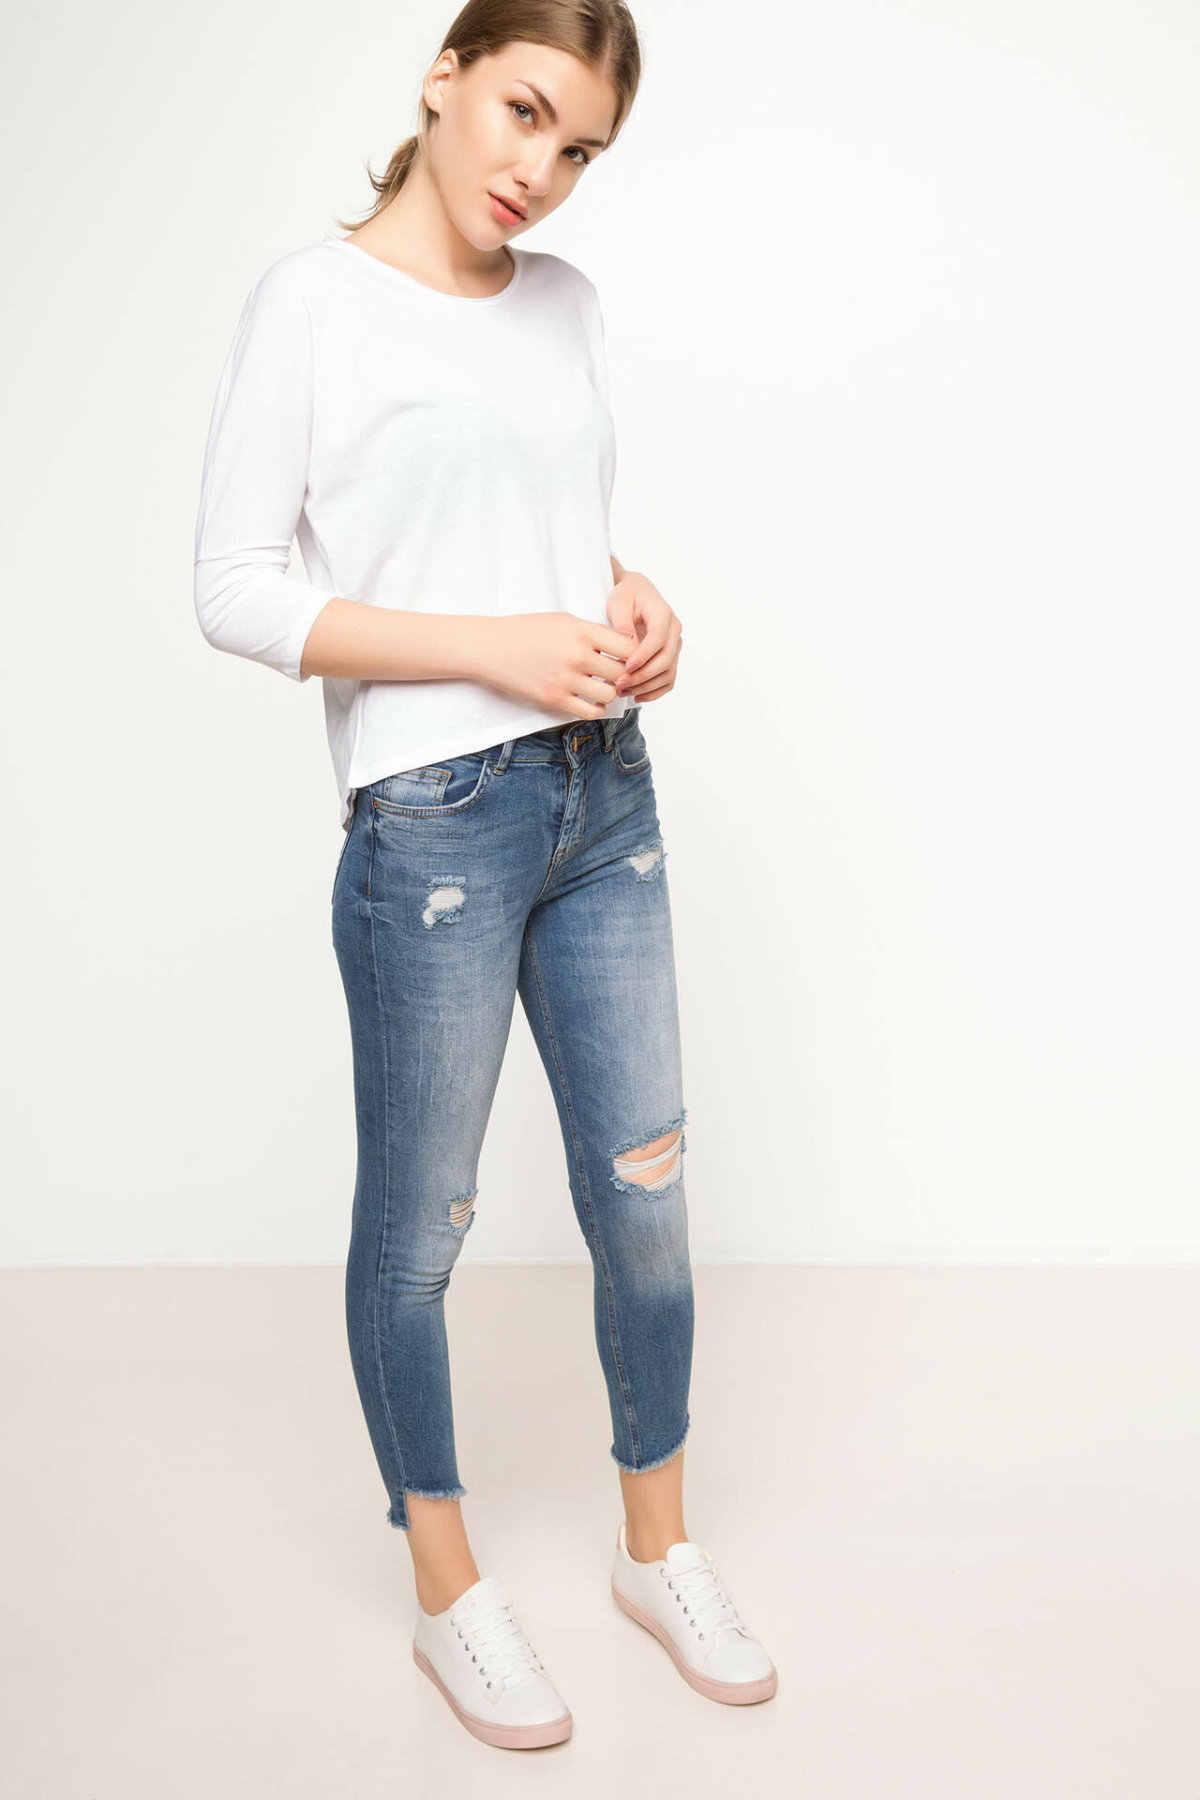 Defacto Wanita Lengan Panjang Kasual Wanita Hitam T-shirt Katun Longgar Leher O Top Tee untuk Musim Gugur Wanita Tops-H9640AZ17AU